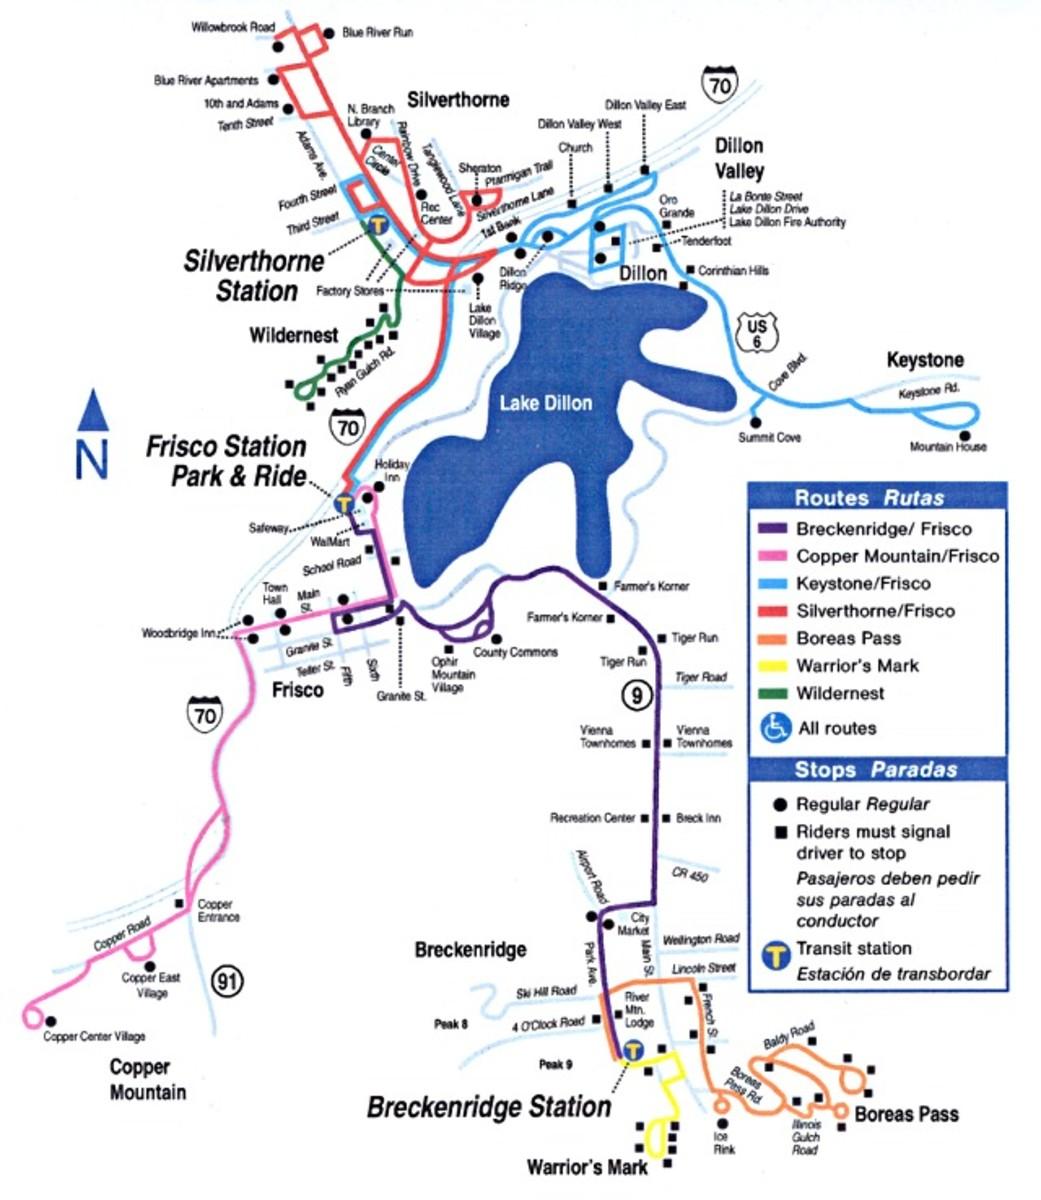 The Best Ski Area in Summit County, Colorado: Copper, Keystone, A-Basin, Breckenridge, or Loveland?